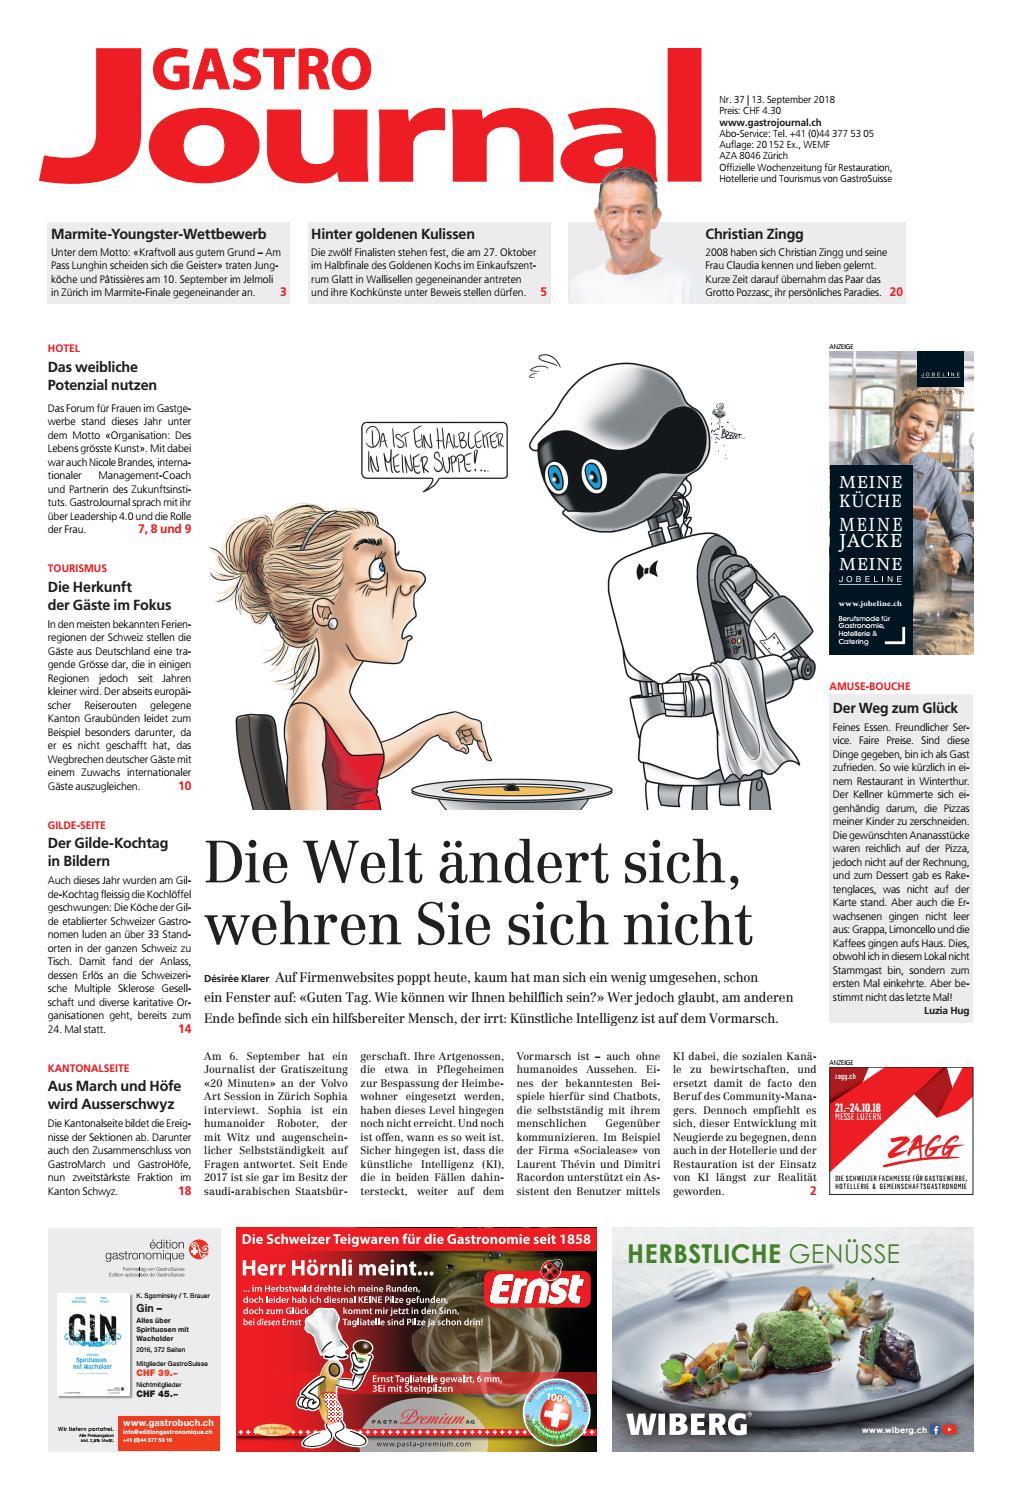 rencontres Seiten Schweiz gratis Speed datant comment il fonctionne